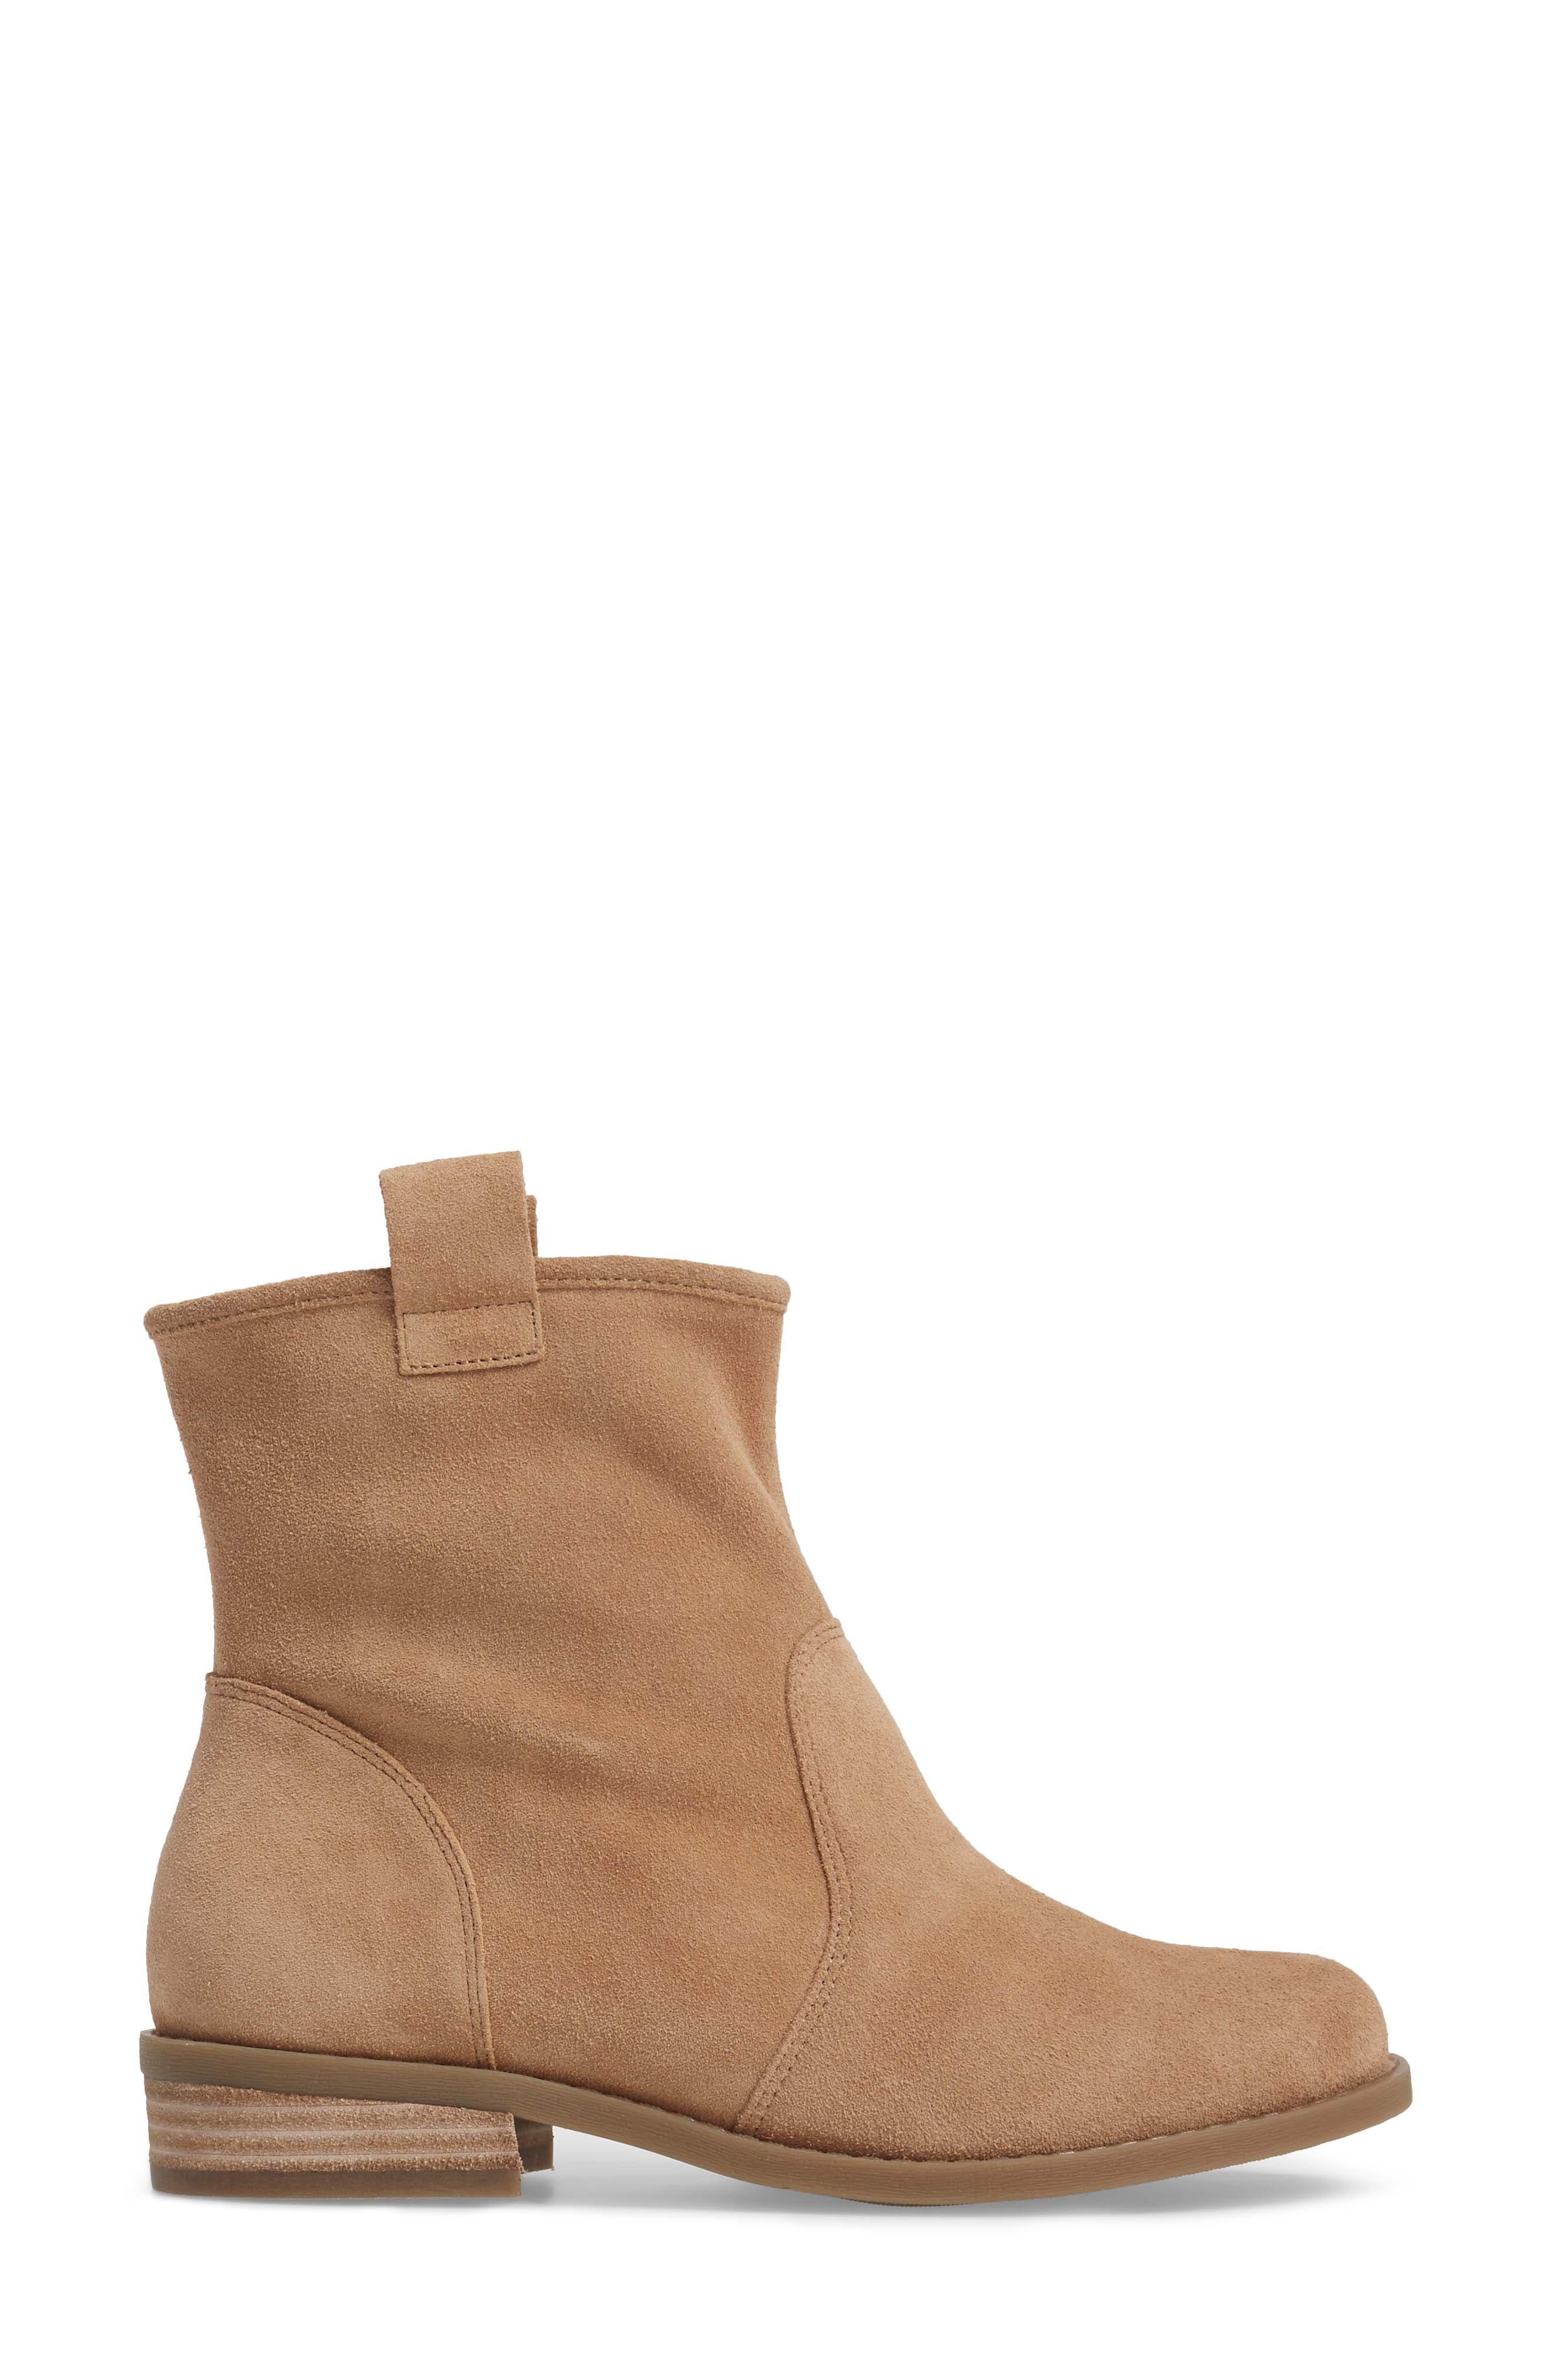 Alternate Image 3  - Sole Society 'Natasha' Boot (Women)